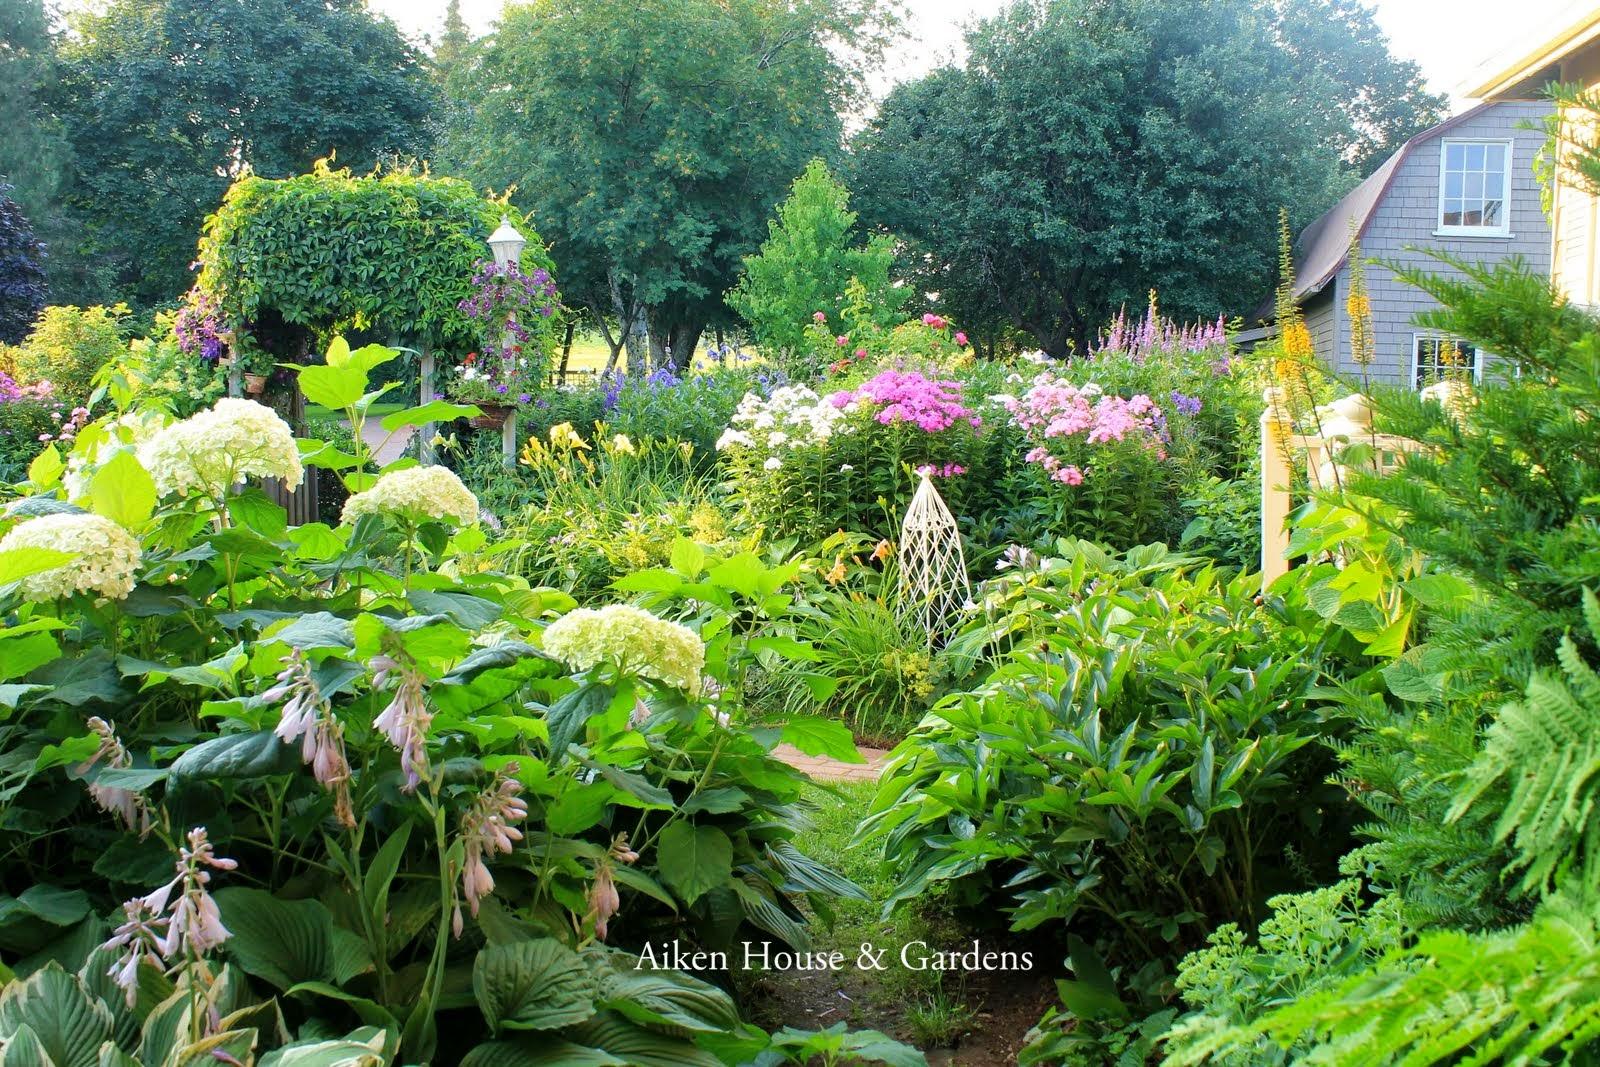 aiken house gardens in an english country garden. Black Bedroom Furniture Sets. Home Design Ideas